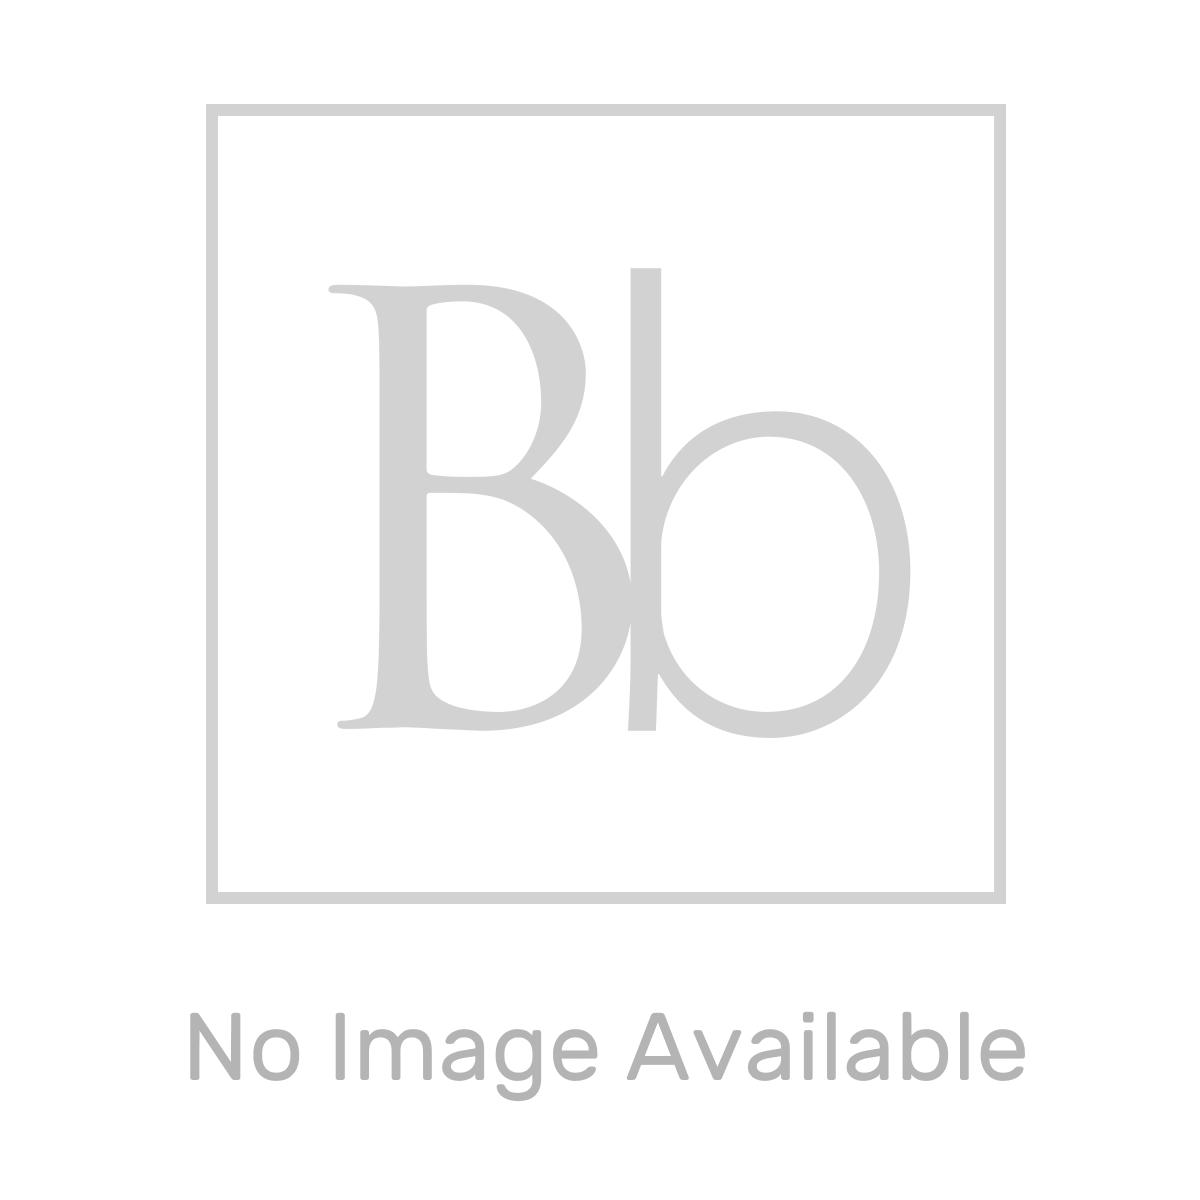 RAK Surface Copper Matt Tile 300 x 600mm Lifestyle